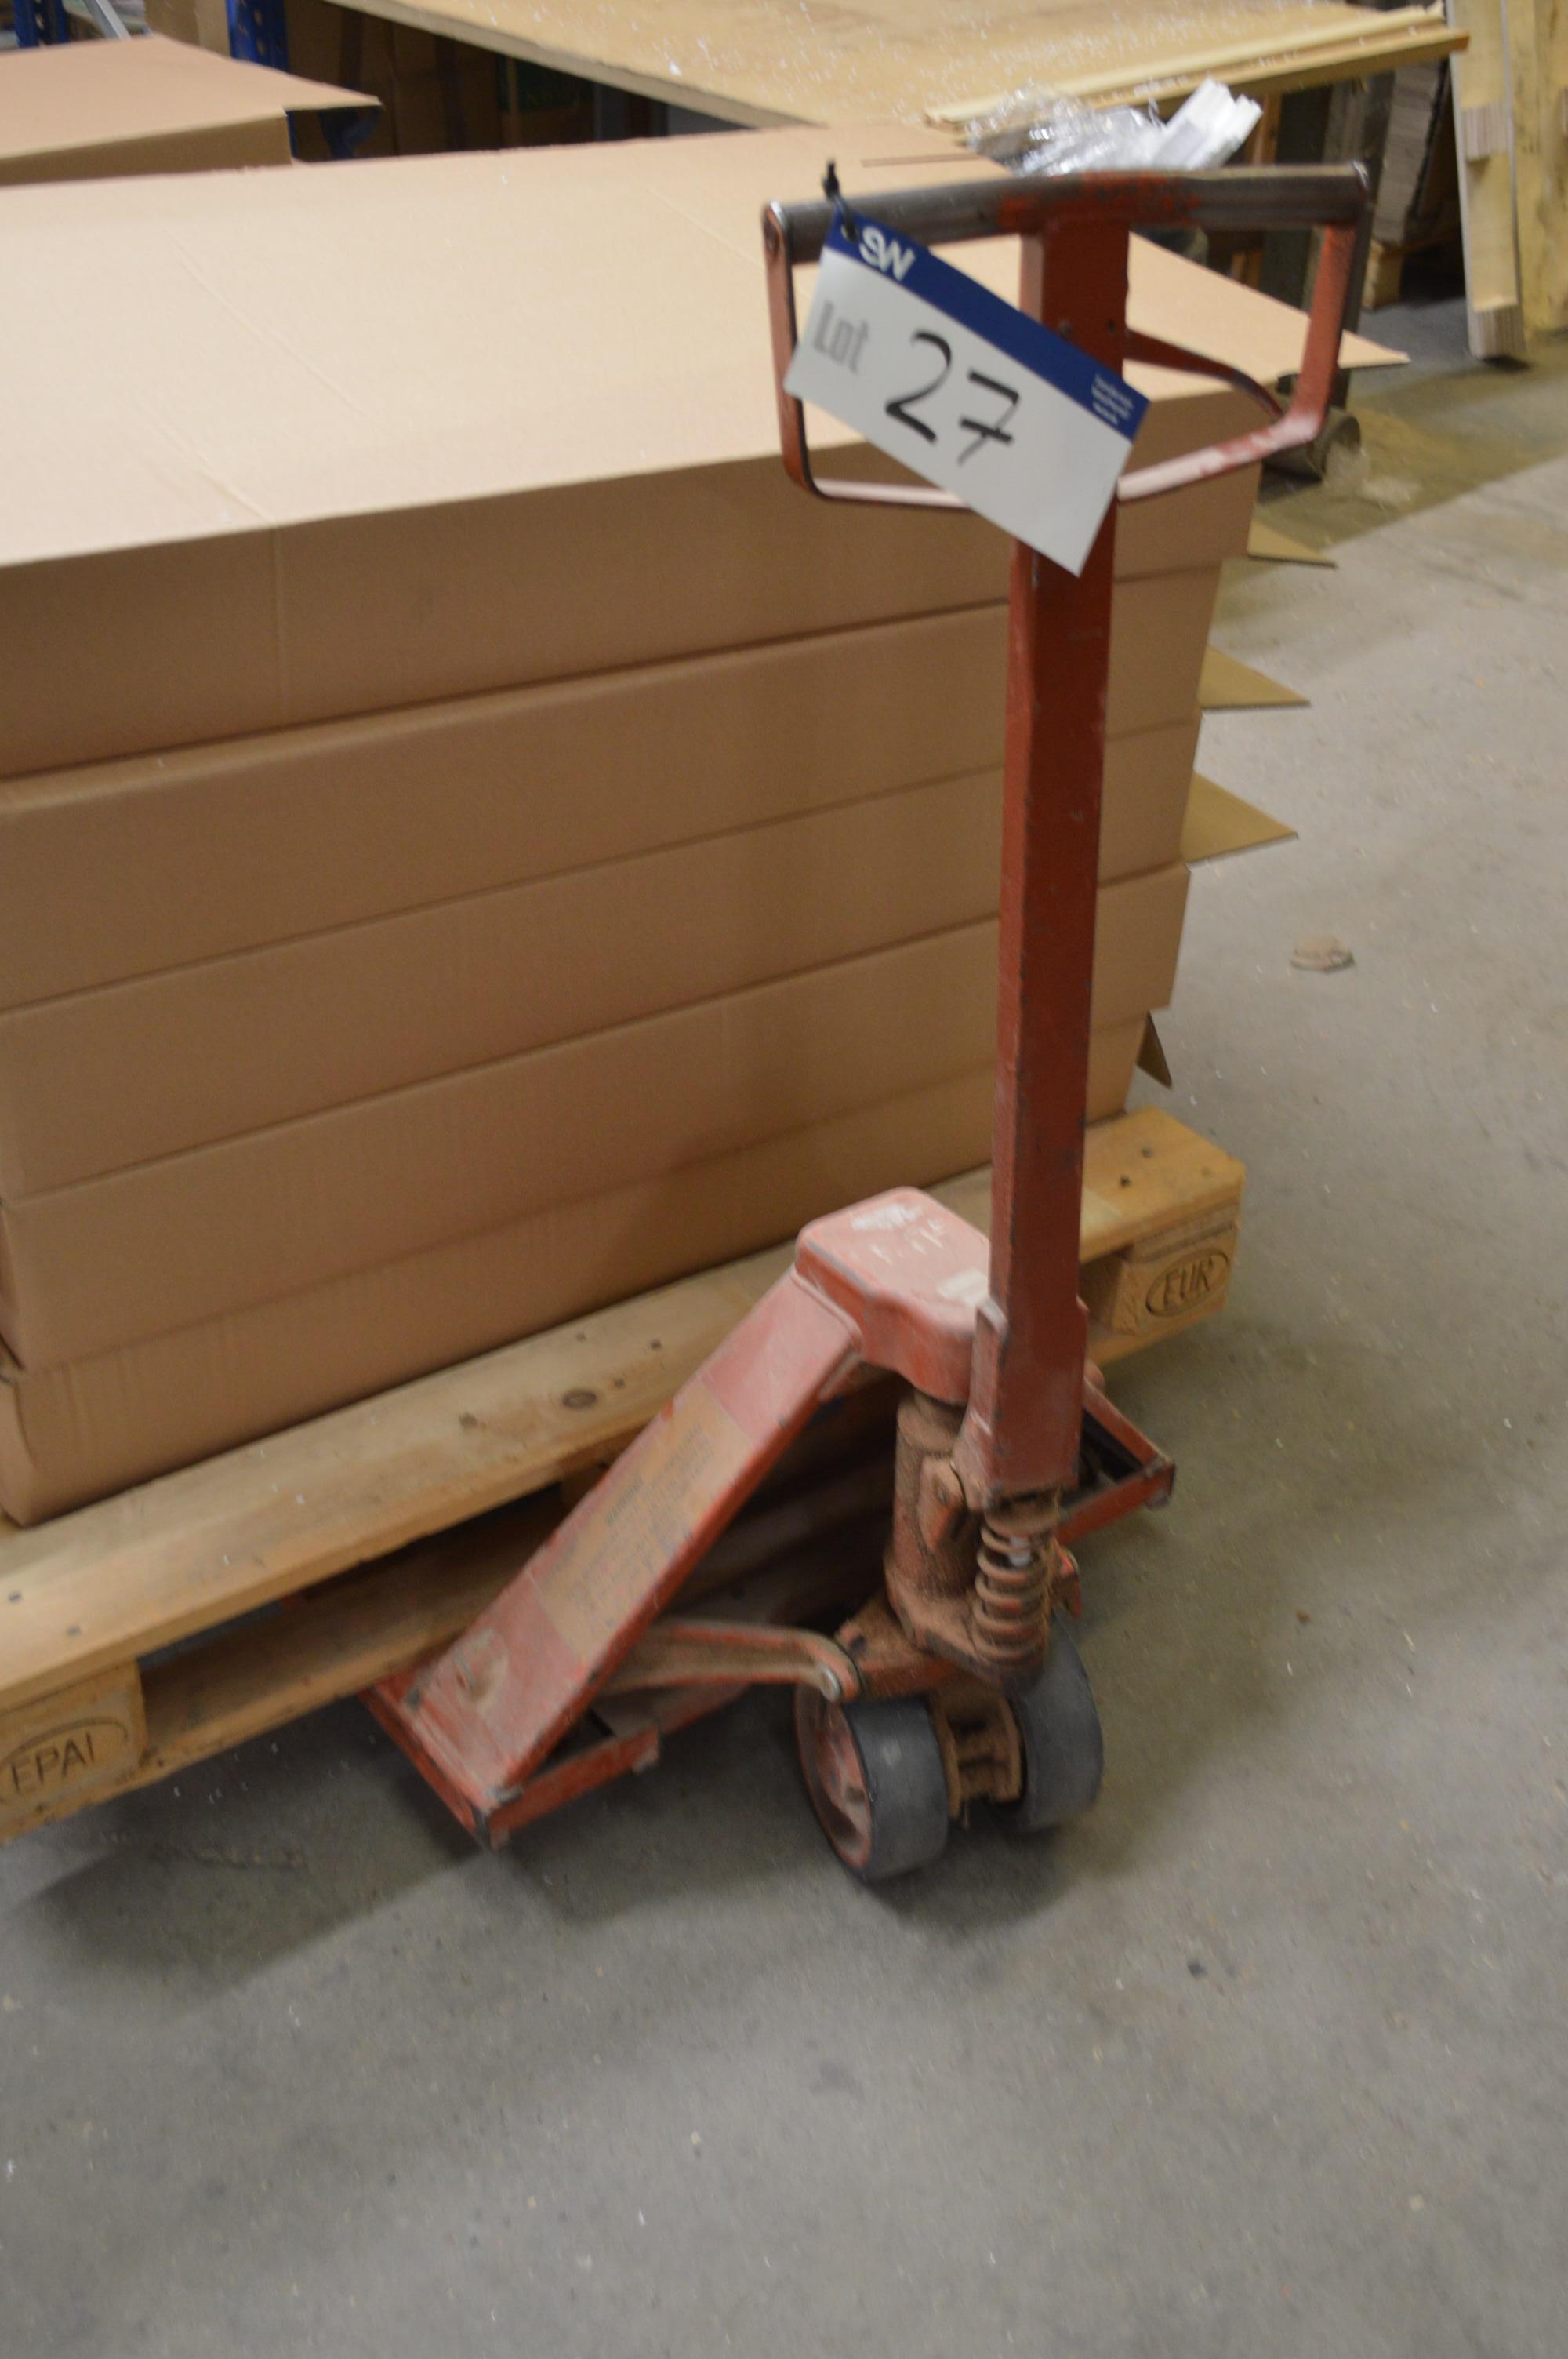 Lot 27 - Hand Hydraulic Pallet Truck(please note-lots situ